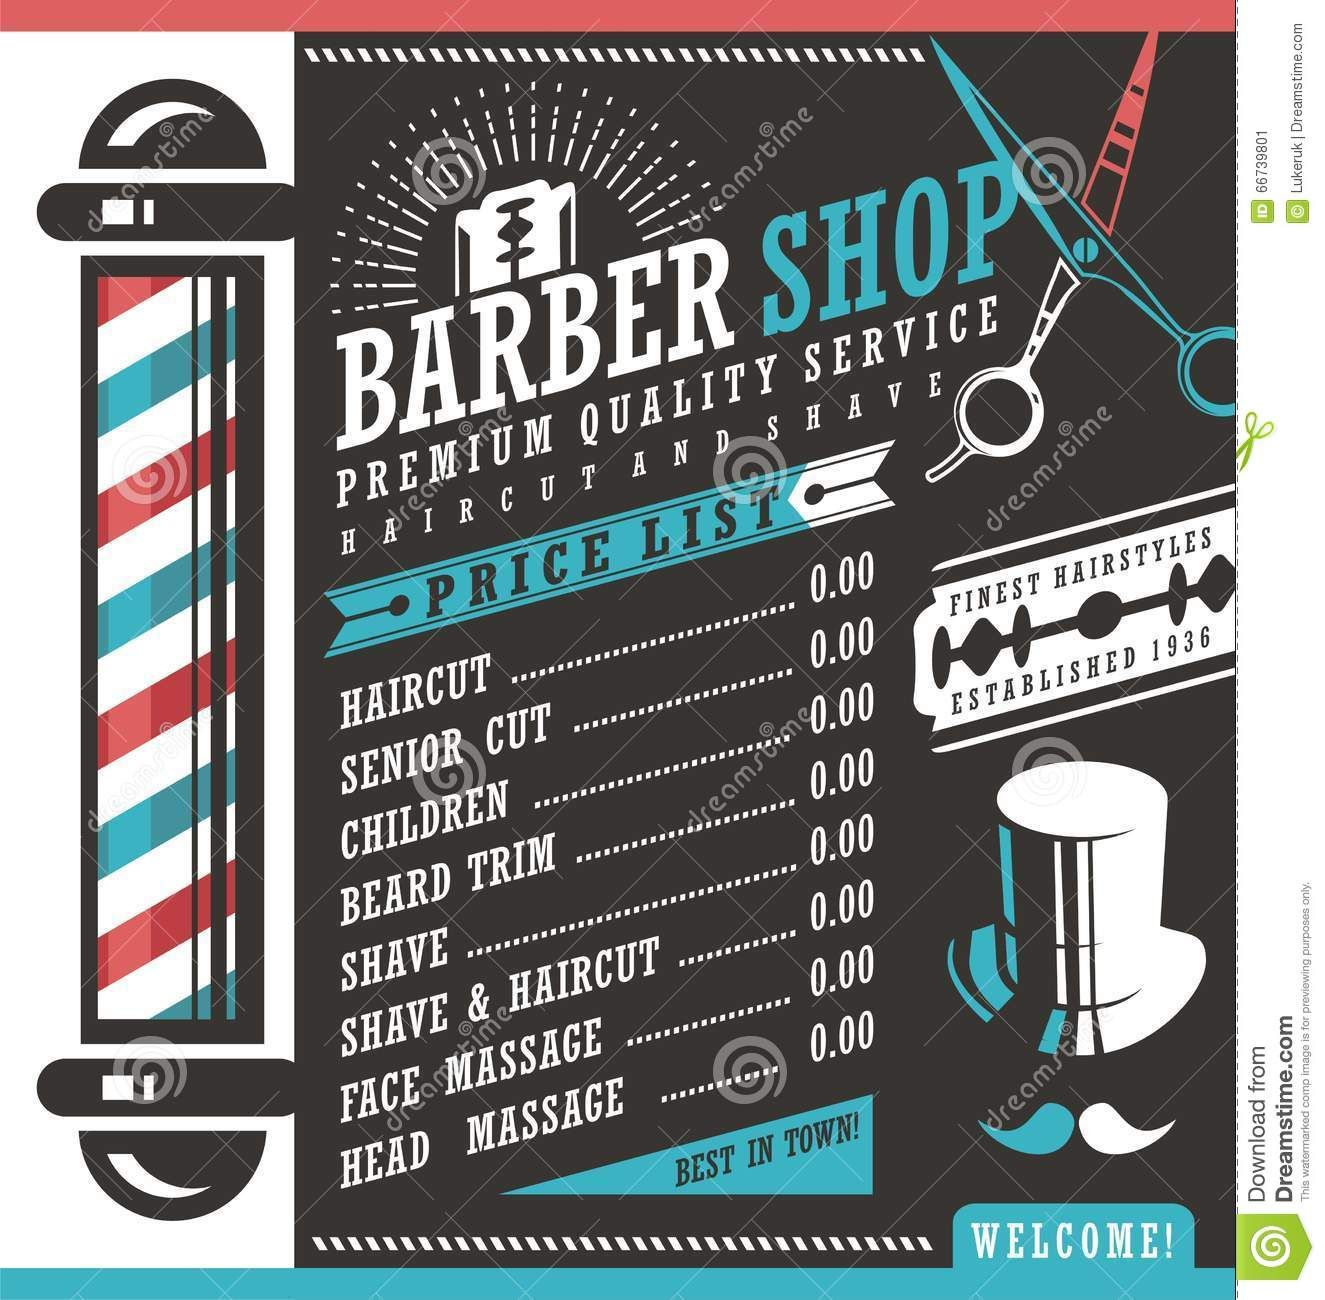 Barber Shop Price List Template Haircut Shave Retro Sign Dark Background Gentlemen Hair Sty Ideias Para Barbearias Desenhos Para Barbearia Projeto De Barbearia